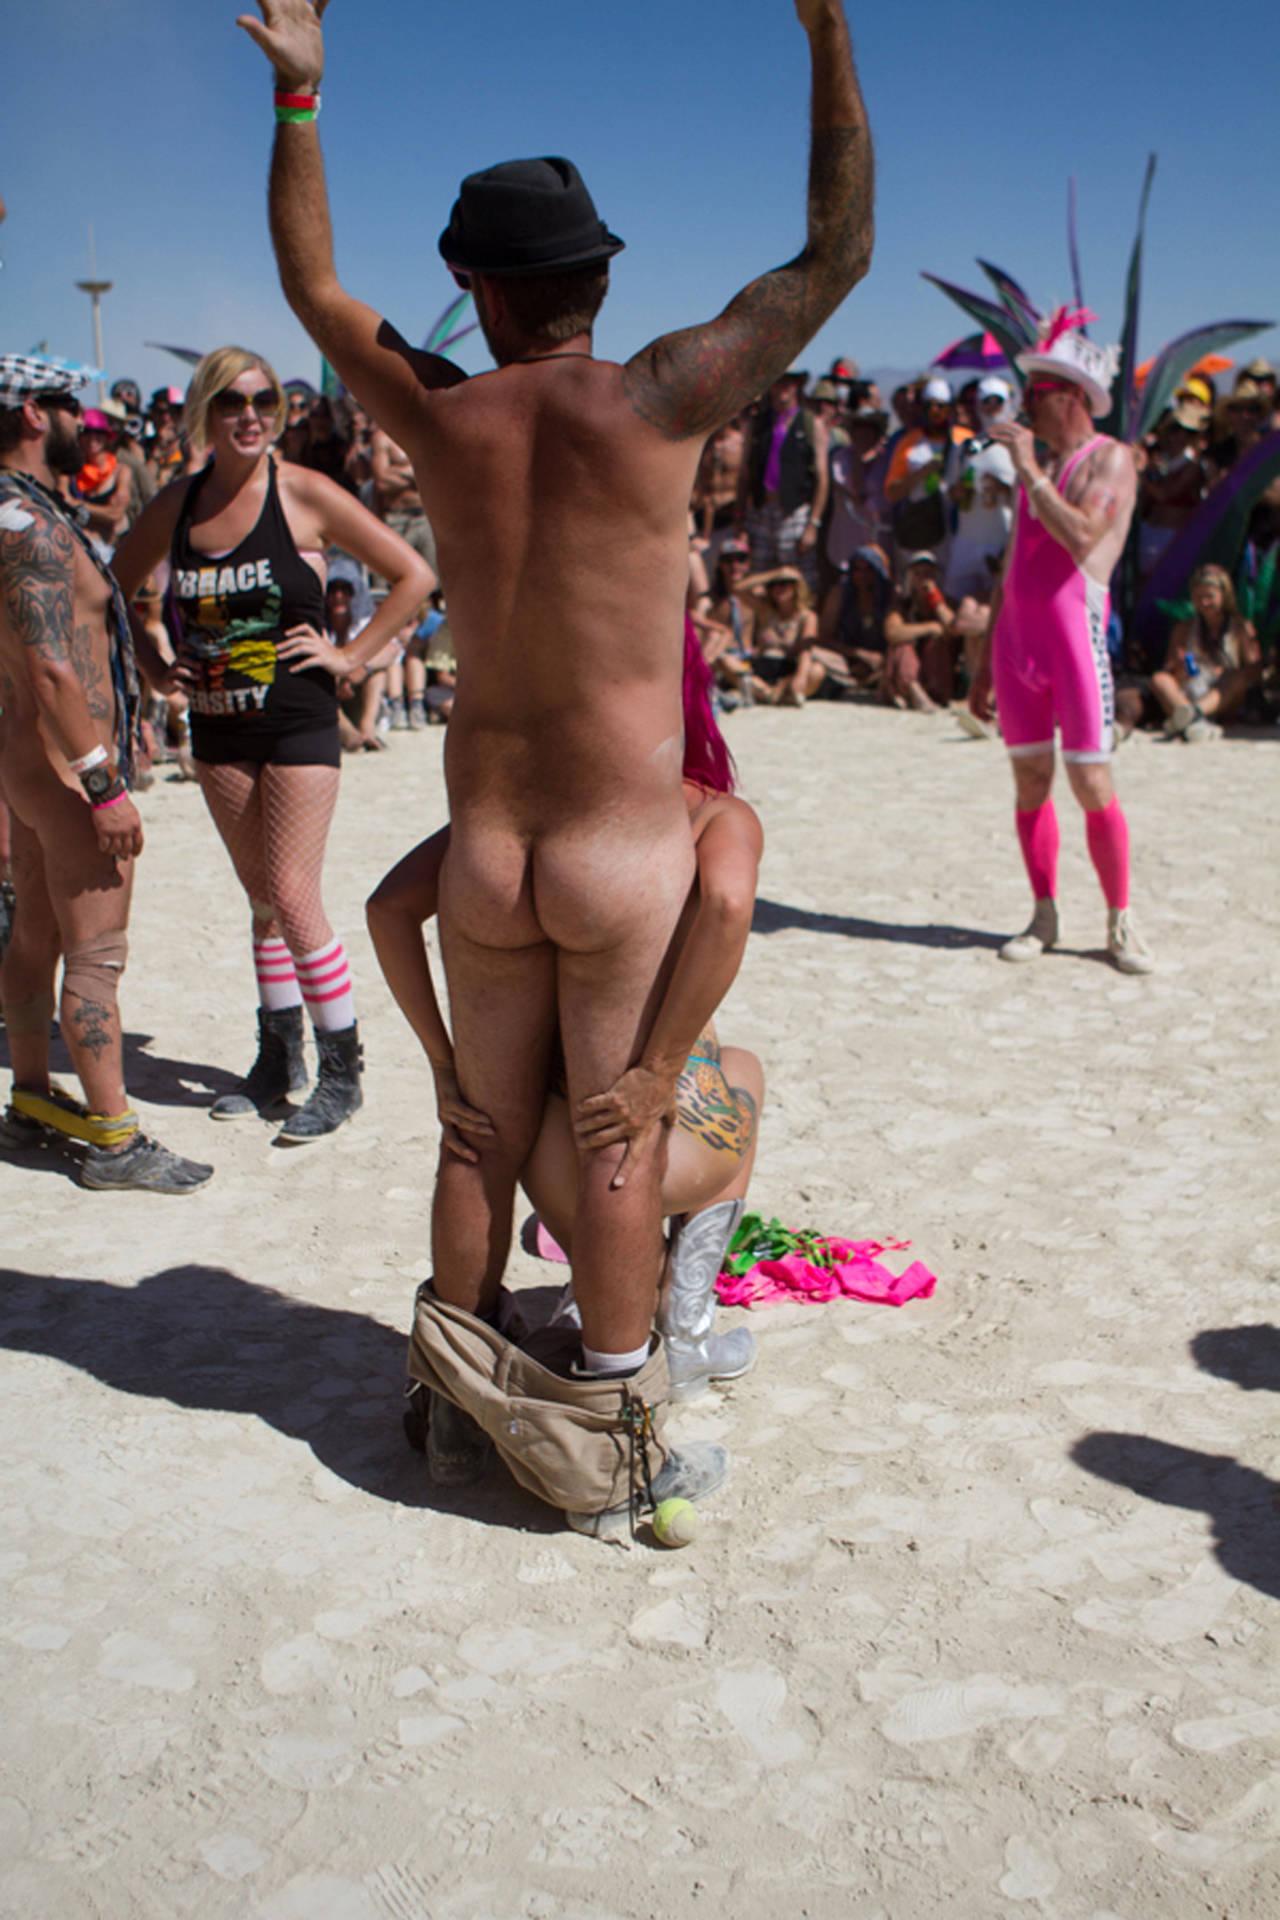 At burning man nude in public